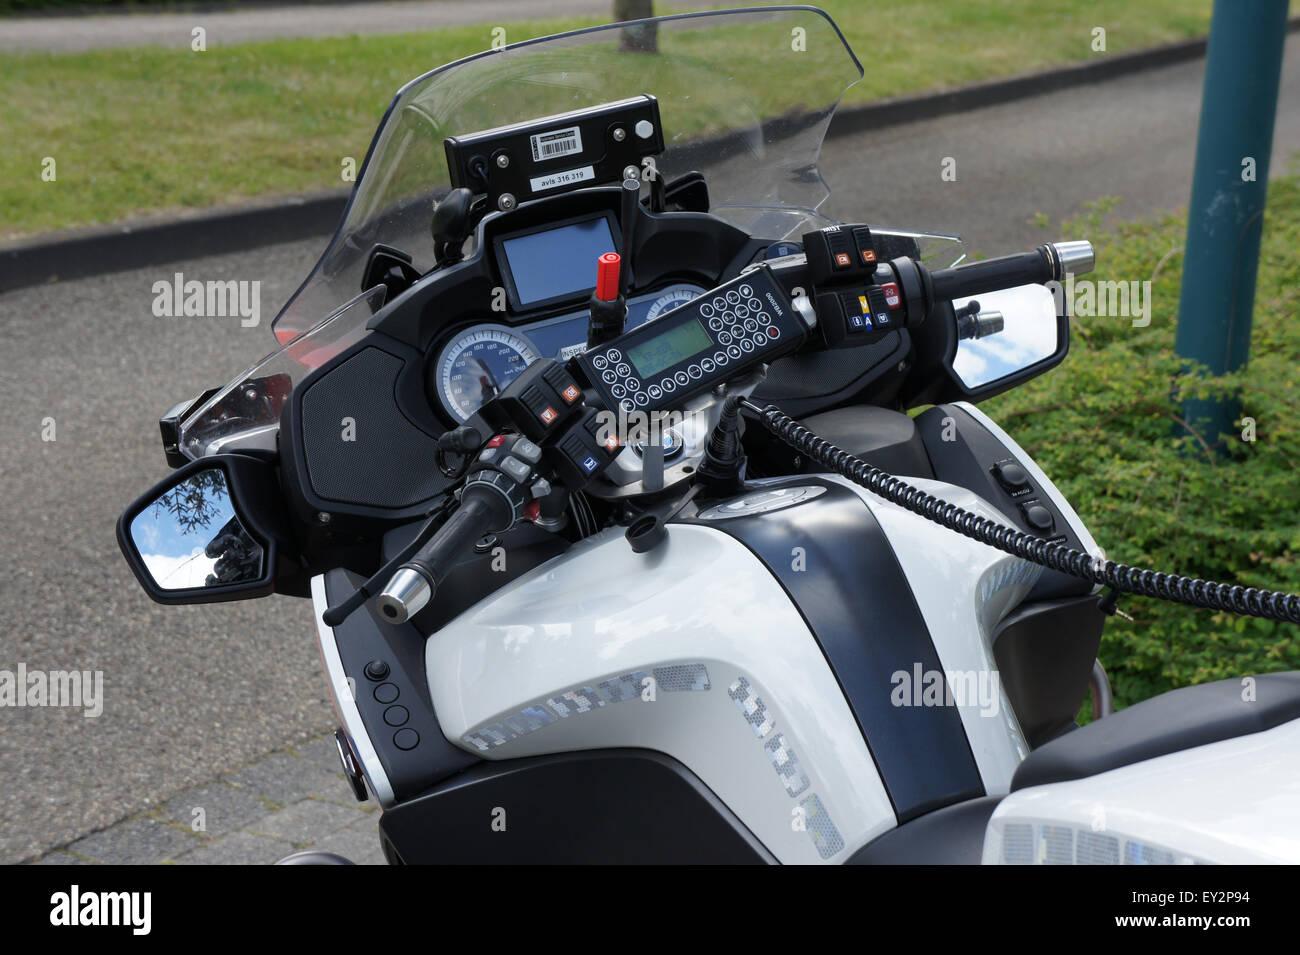 Police Motorbike Bmw R1200rt Unit 66 51 Pic2 Stock Photo 85498592